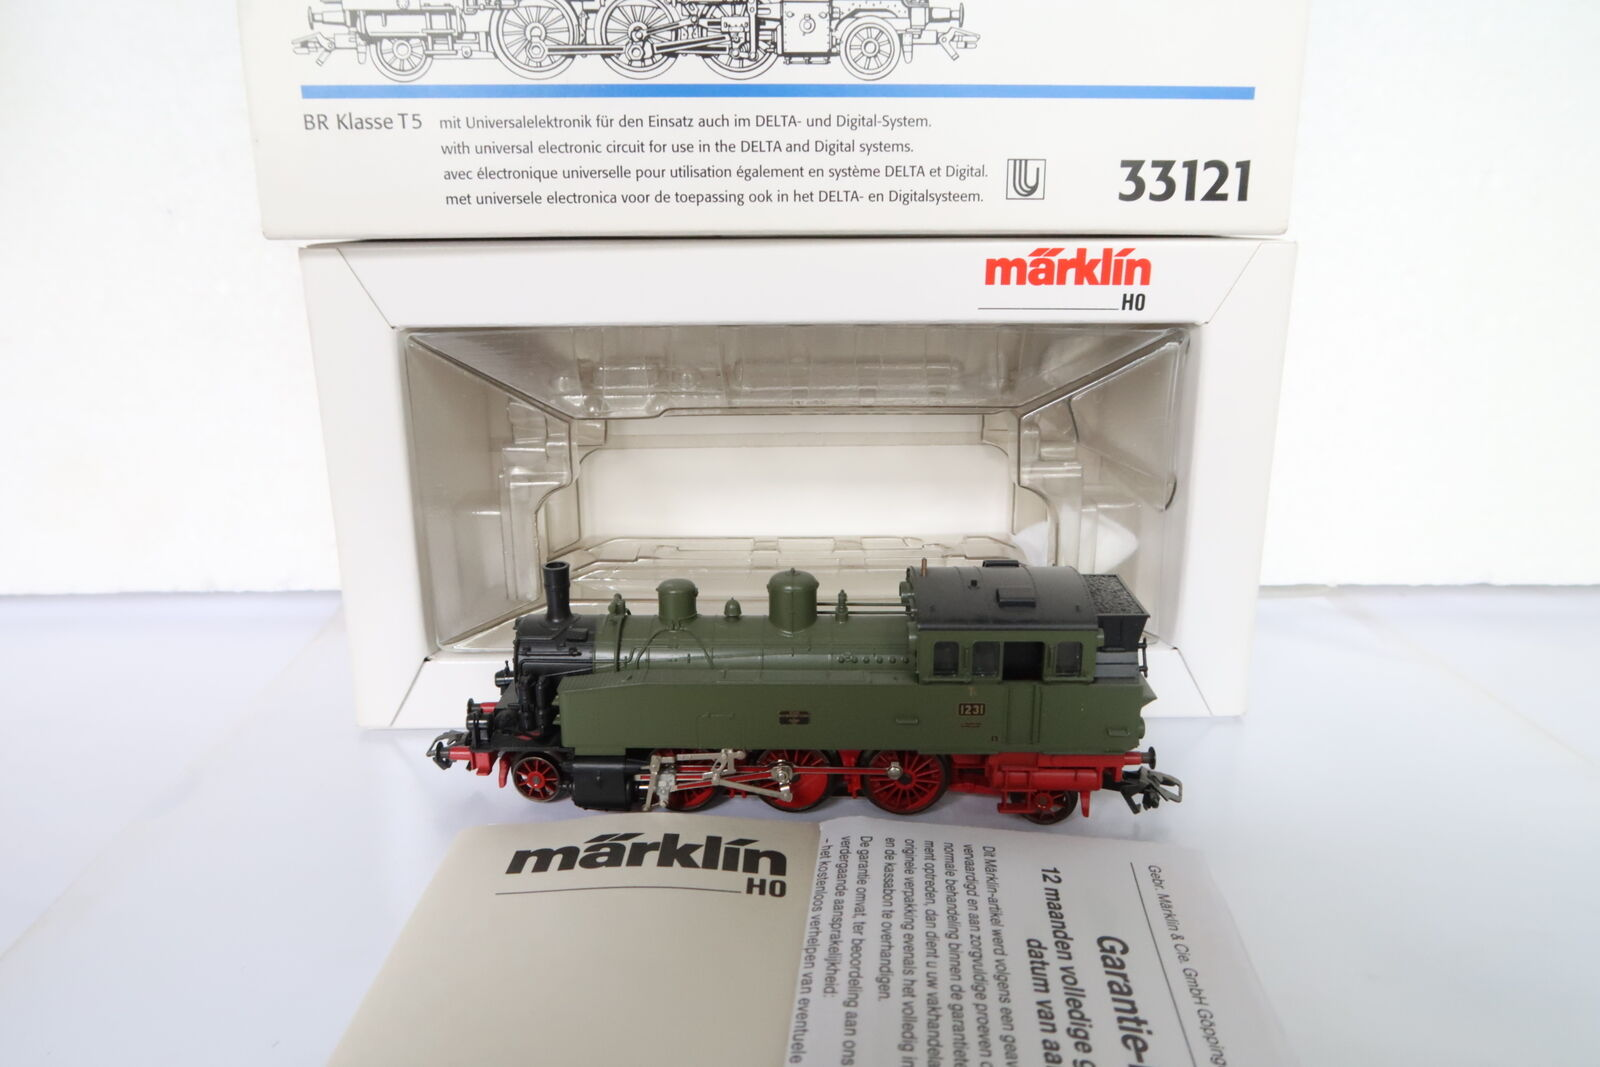 Digital Märklin HO AC 33121 a vapore Lok t5 BR 1231 Württemberg (dh 19-69r3 3)